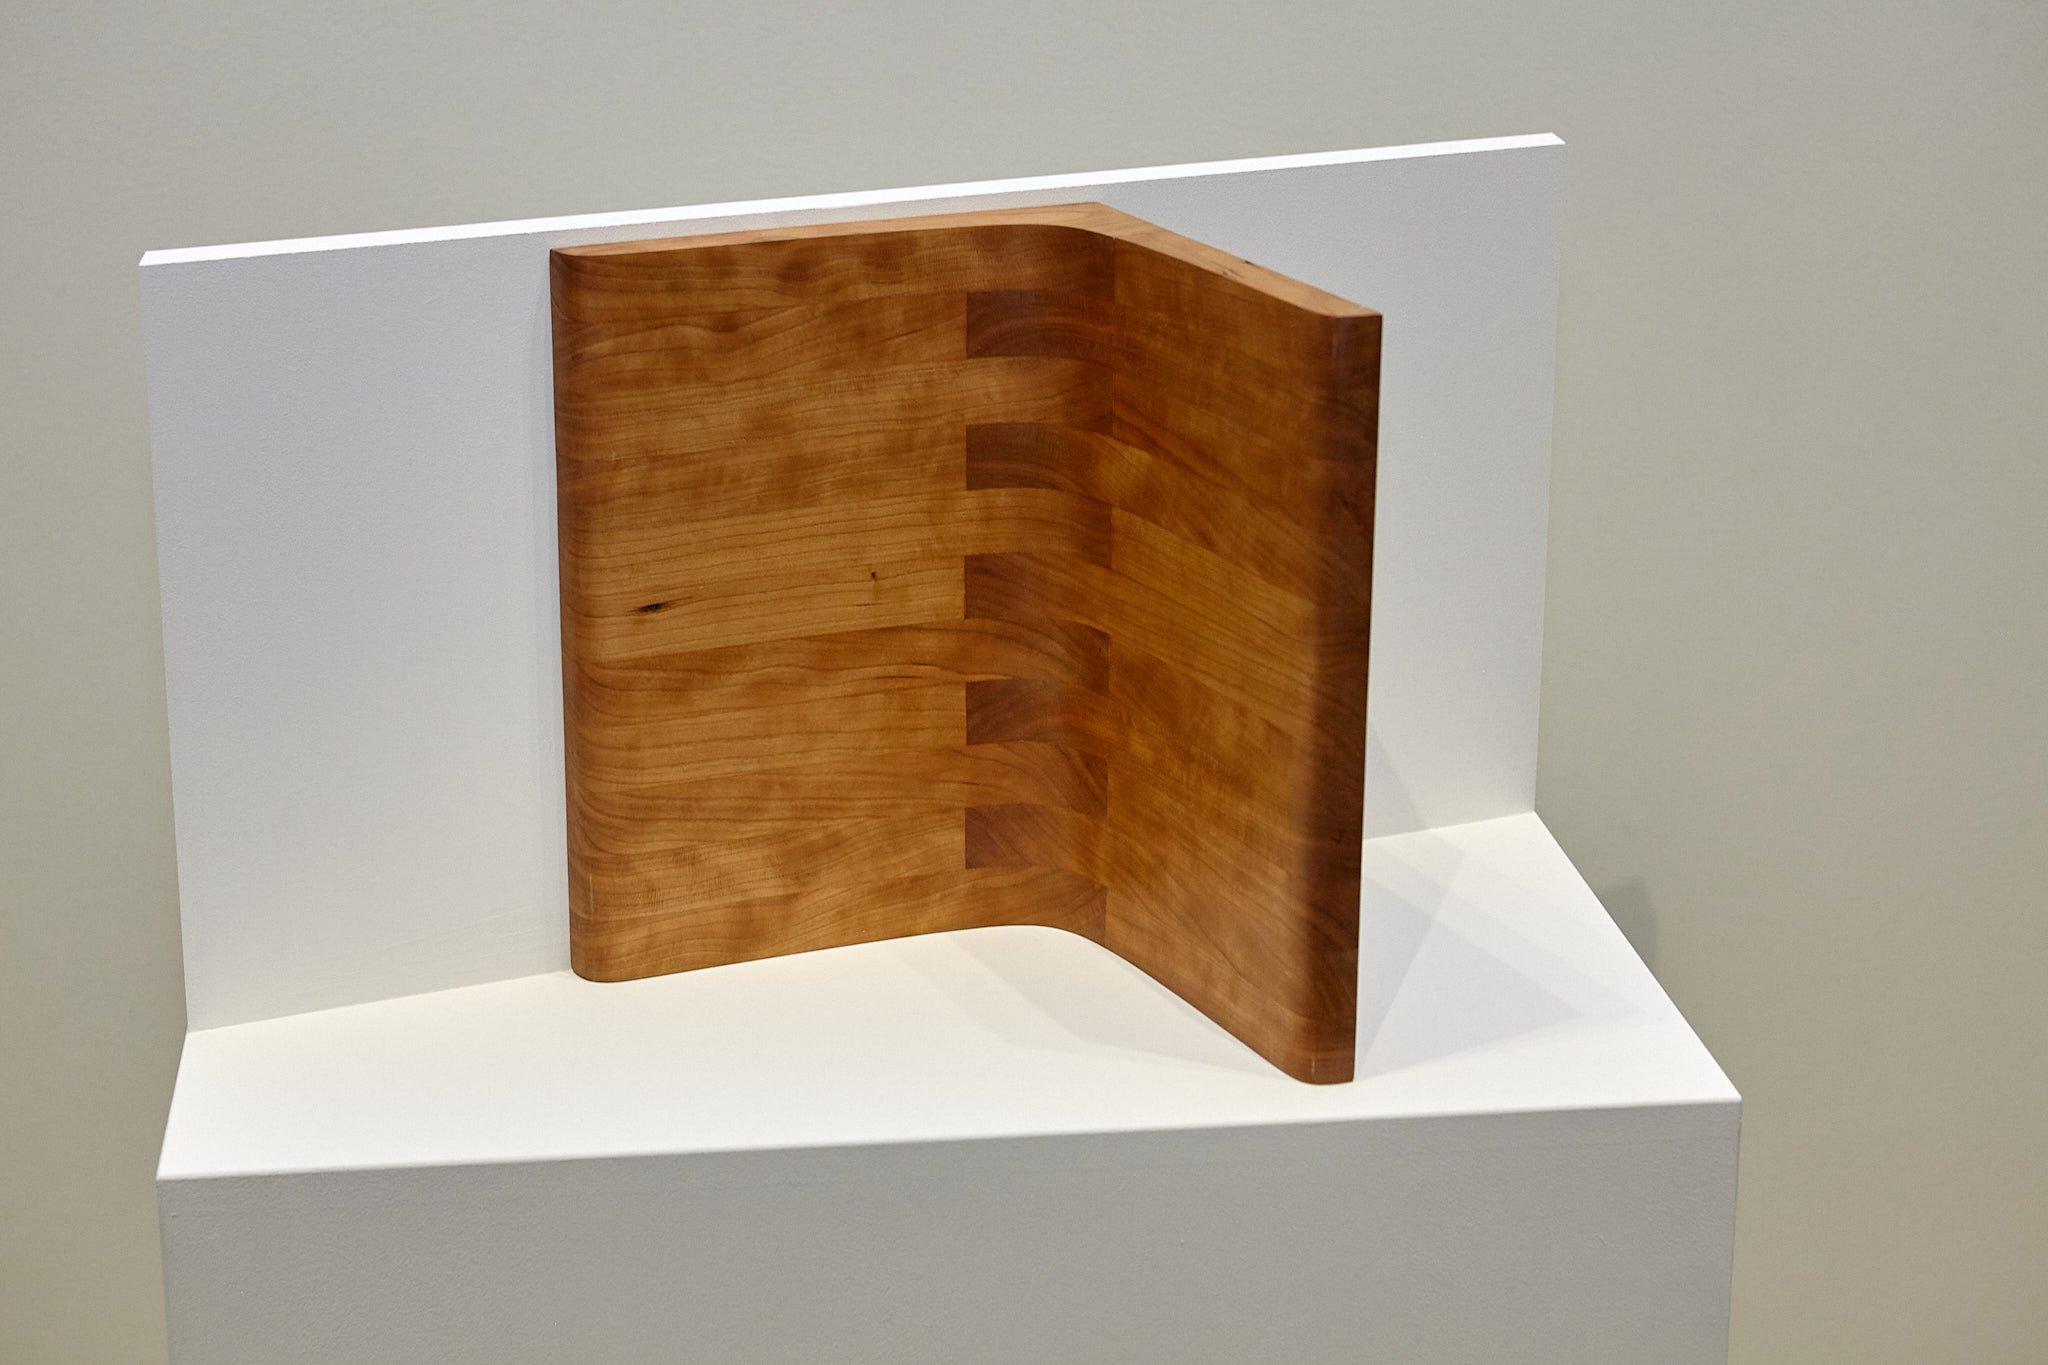 Angle Iron by Graceson Aufderheide